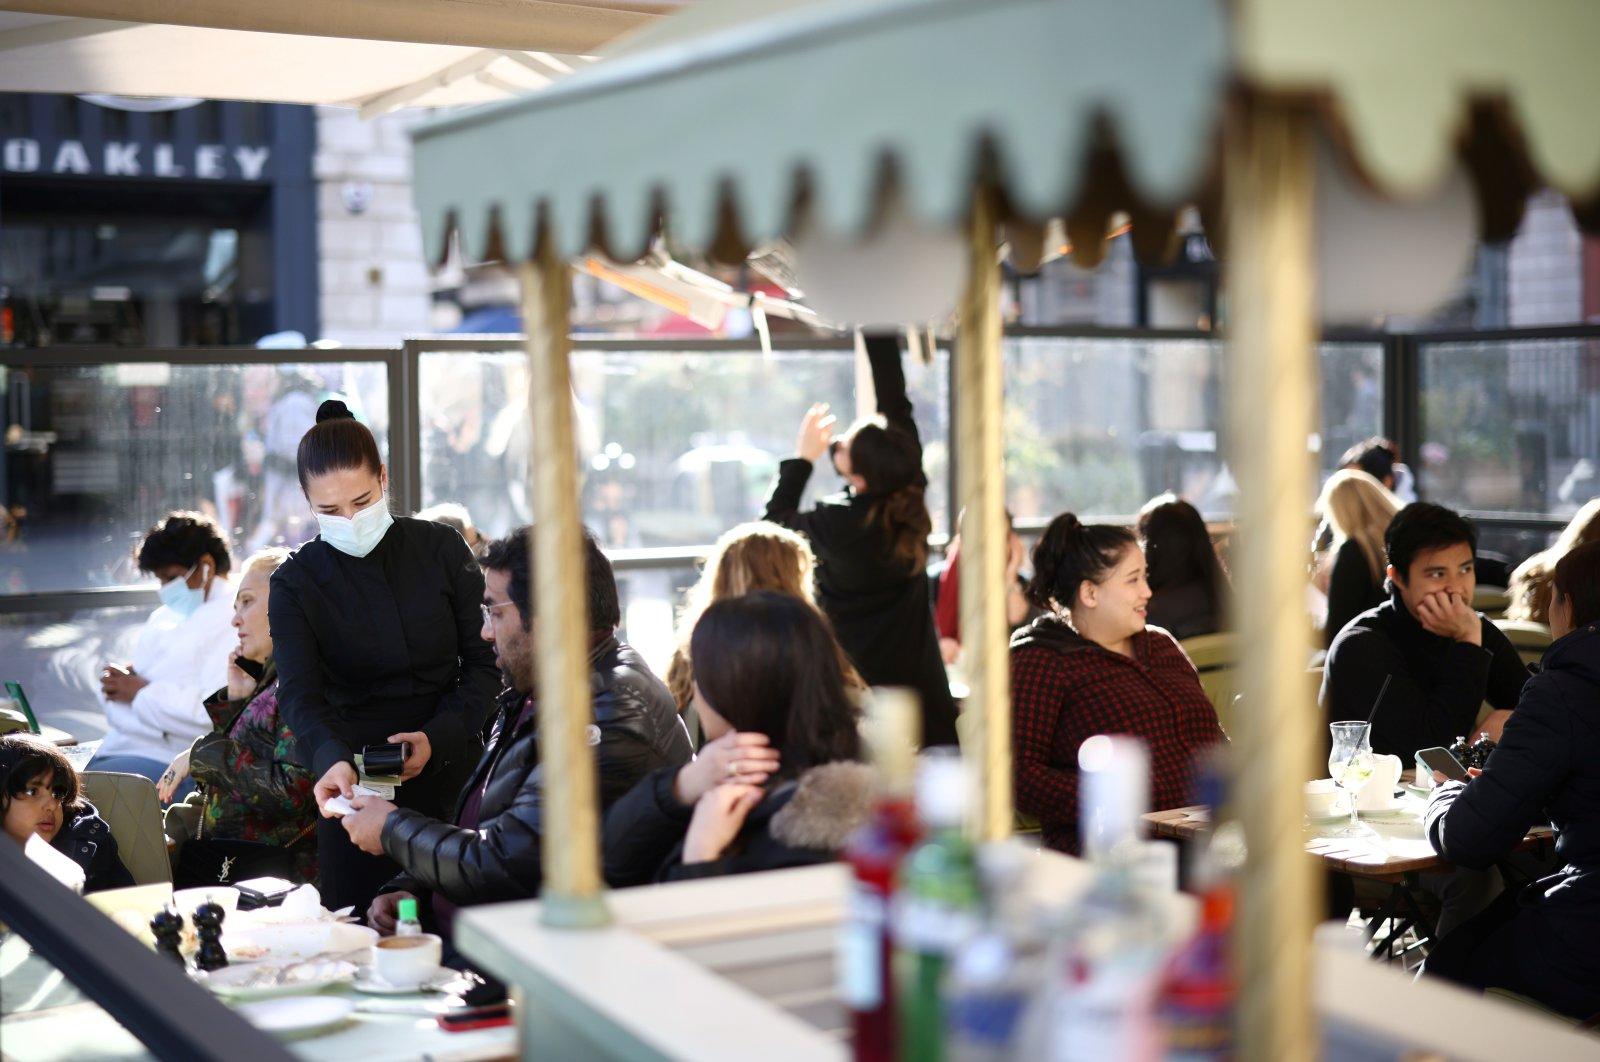 British job ads, restaurant bookings rebound as economy reopens